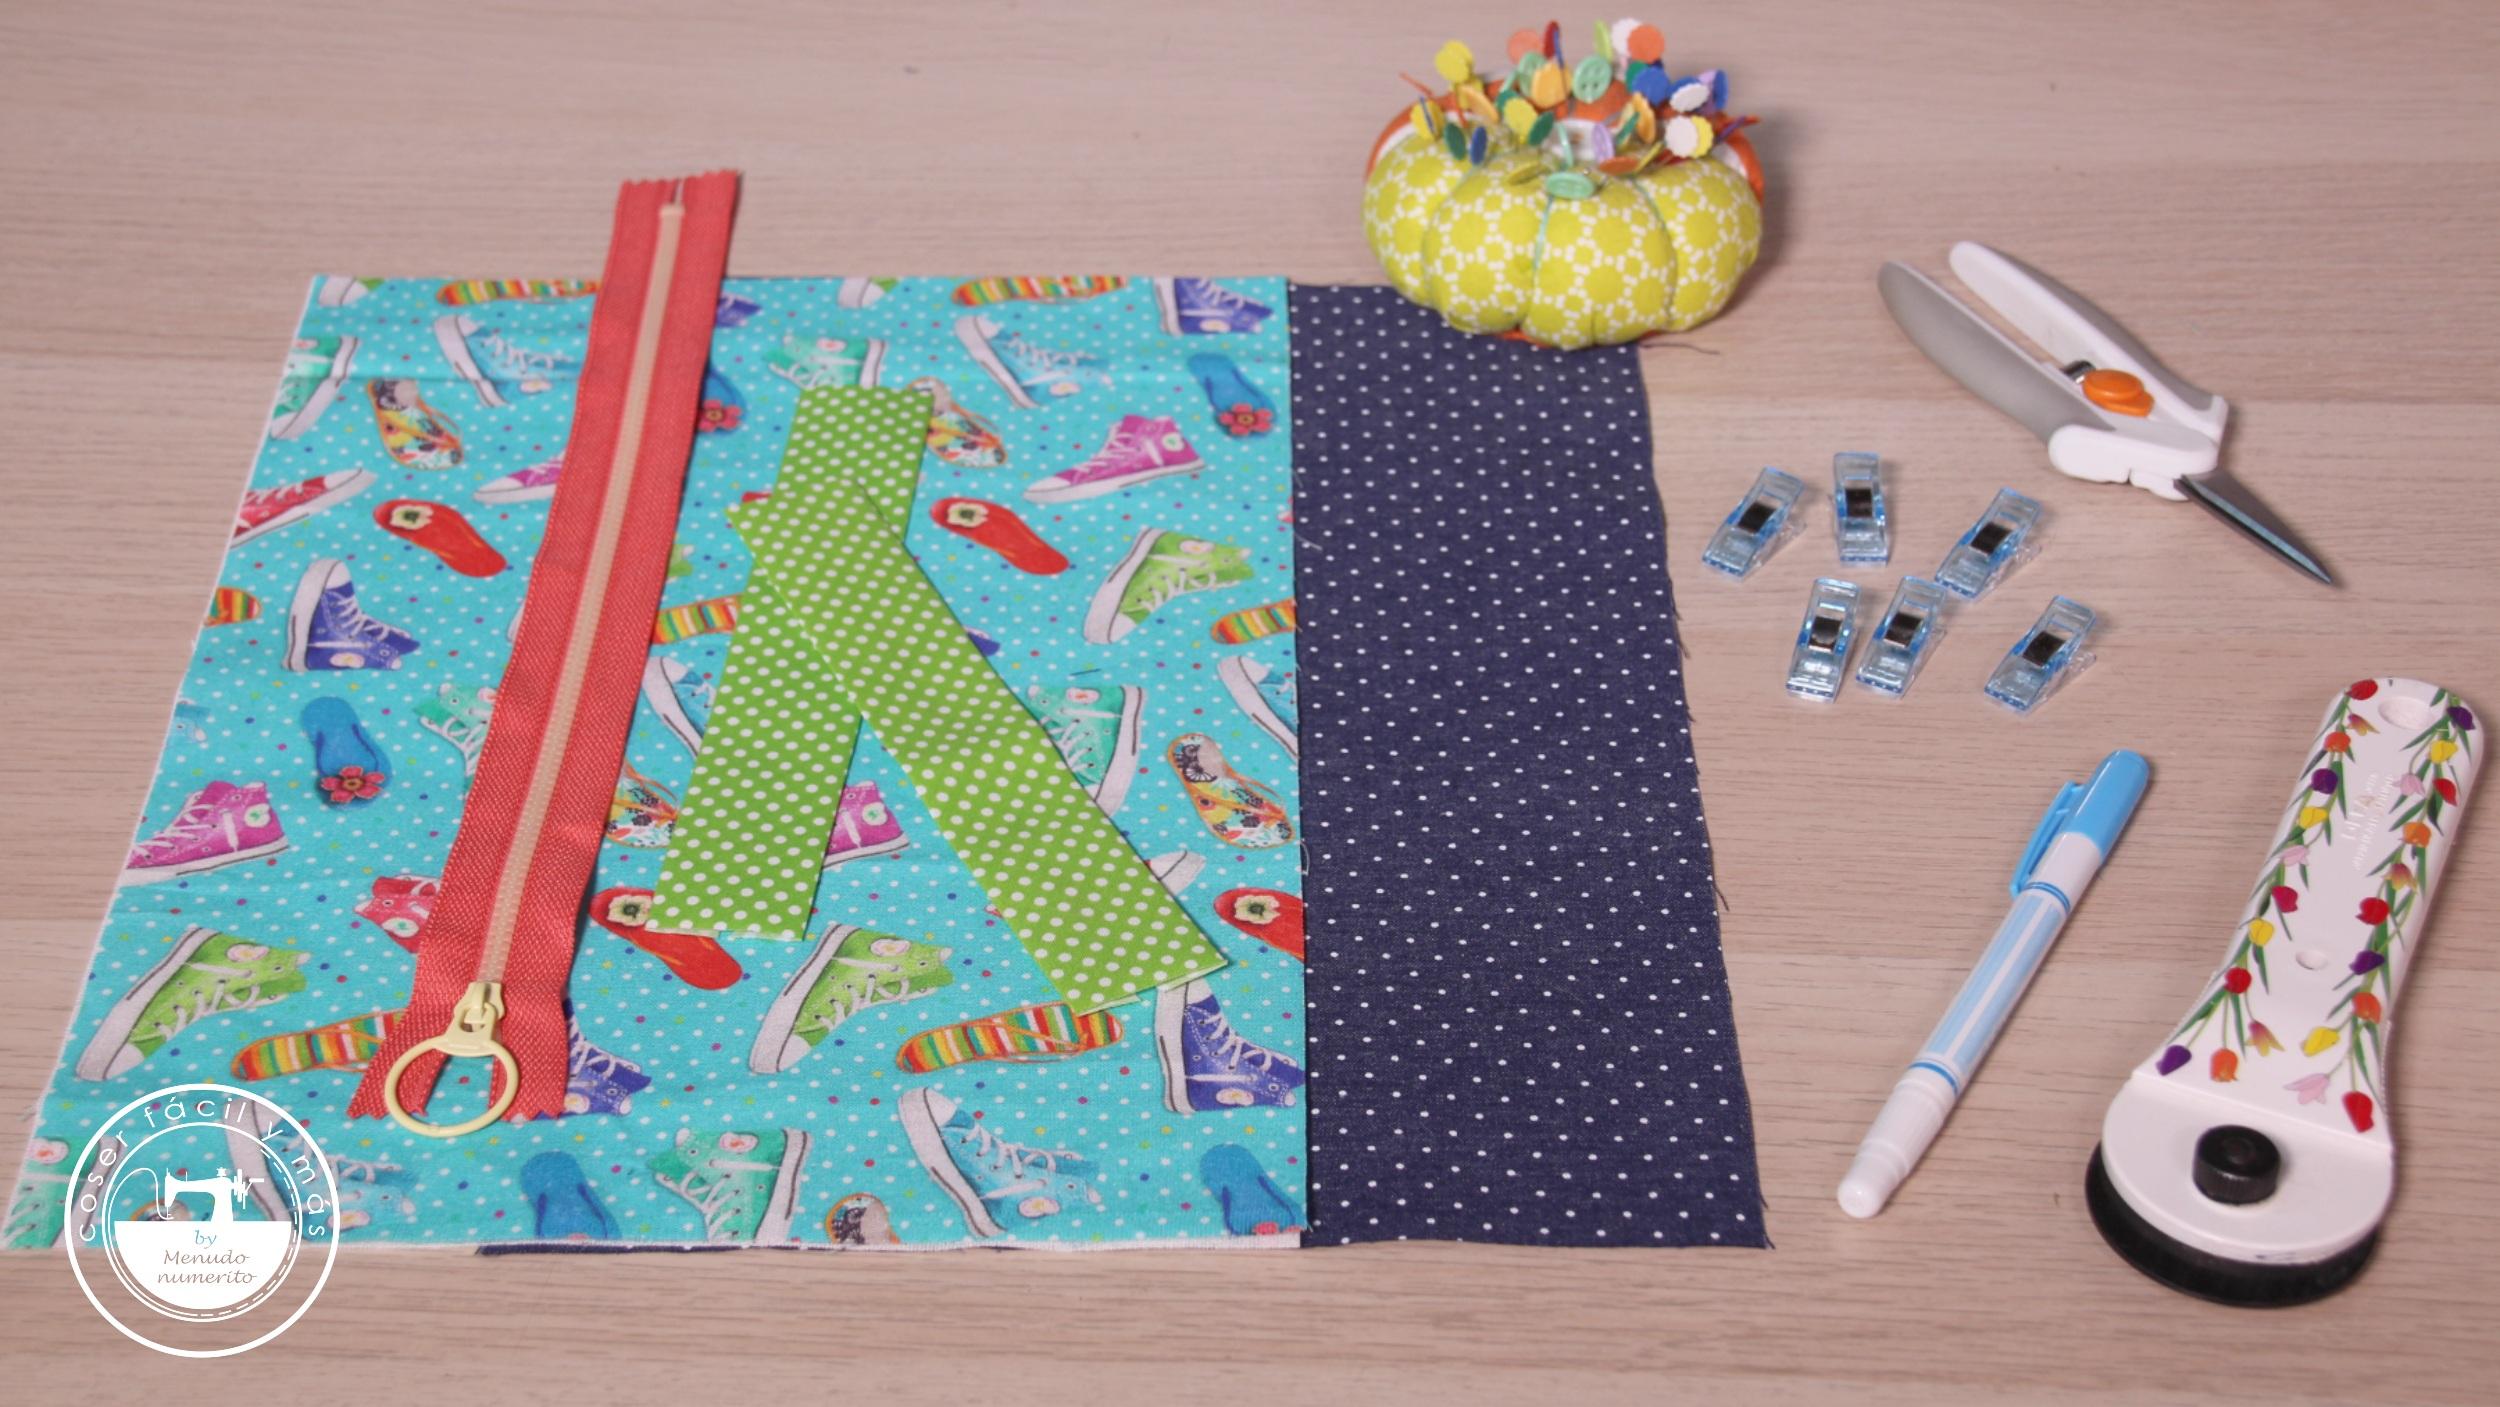 neceser bolsa de palomitas menudo numerito tutorial blogs de costura